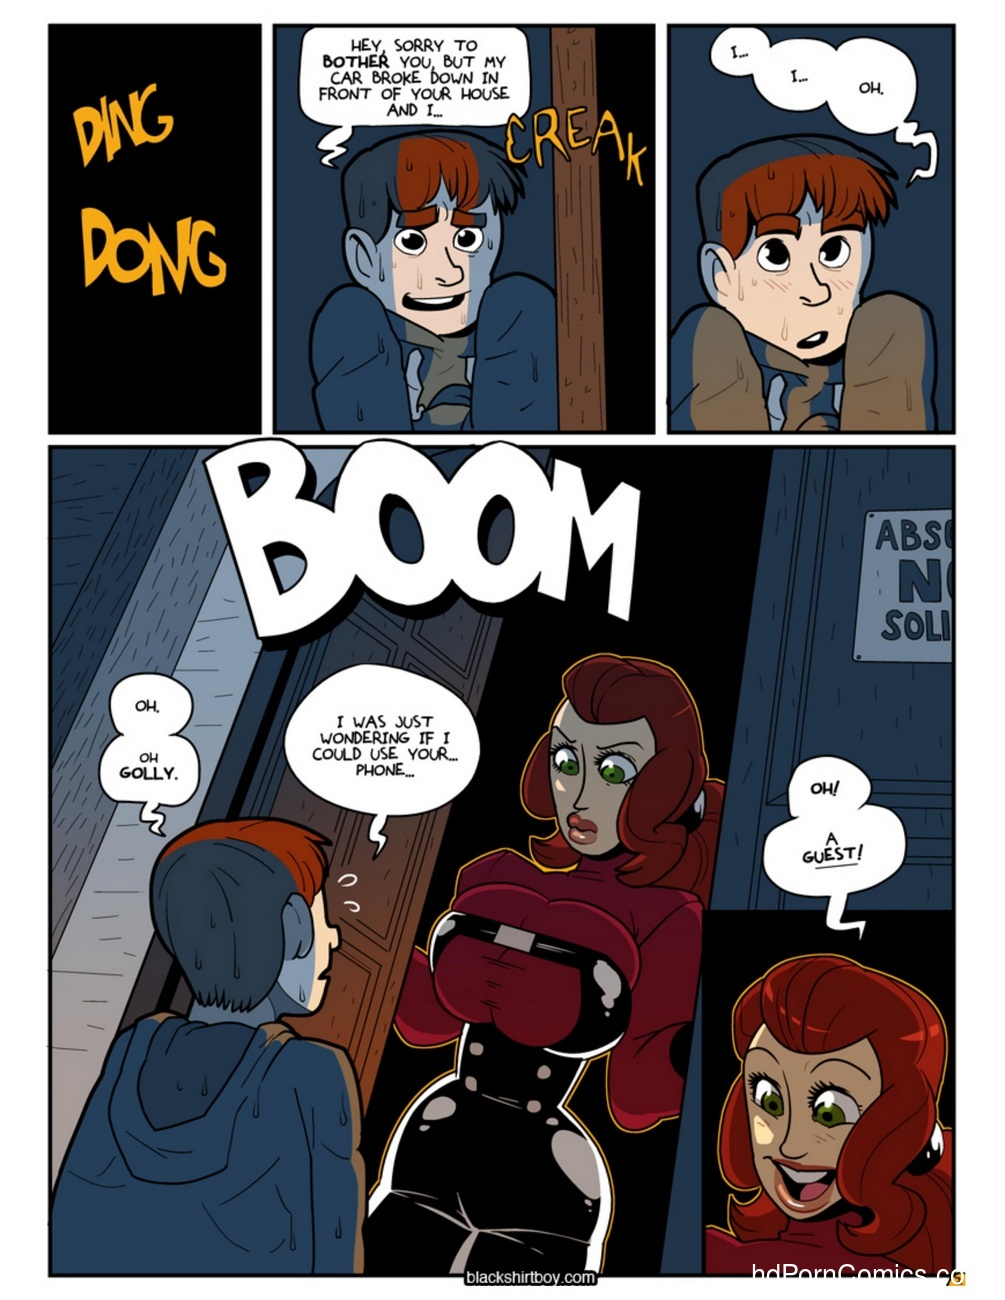 The House Guest Blackshirtboy 3